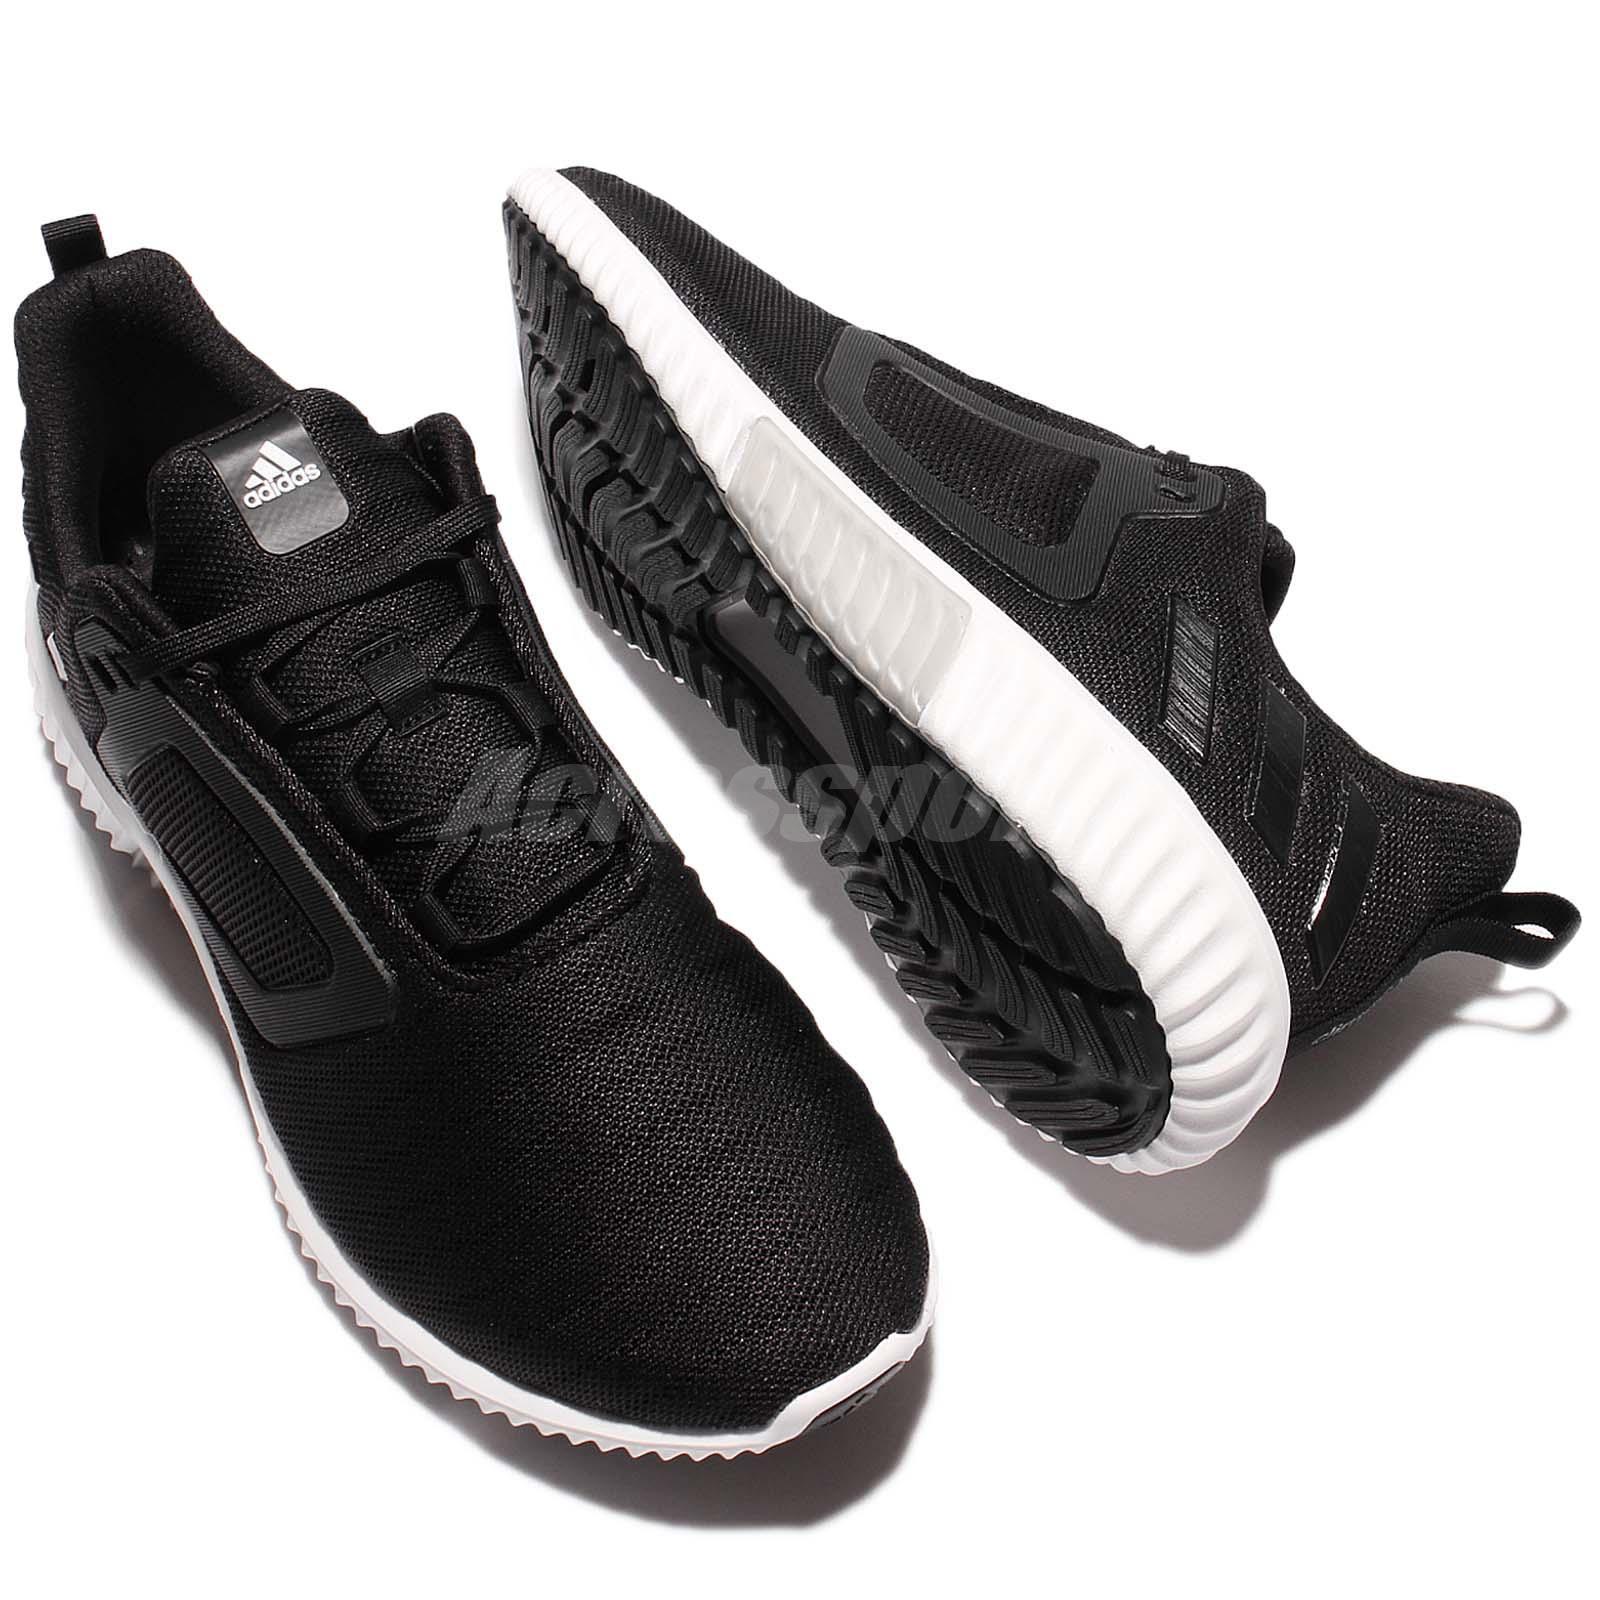 Adidas Adidas Climacool Black todos Full todos Climacool WearTesters a34bf53 - immunitetfolie.website